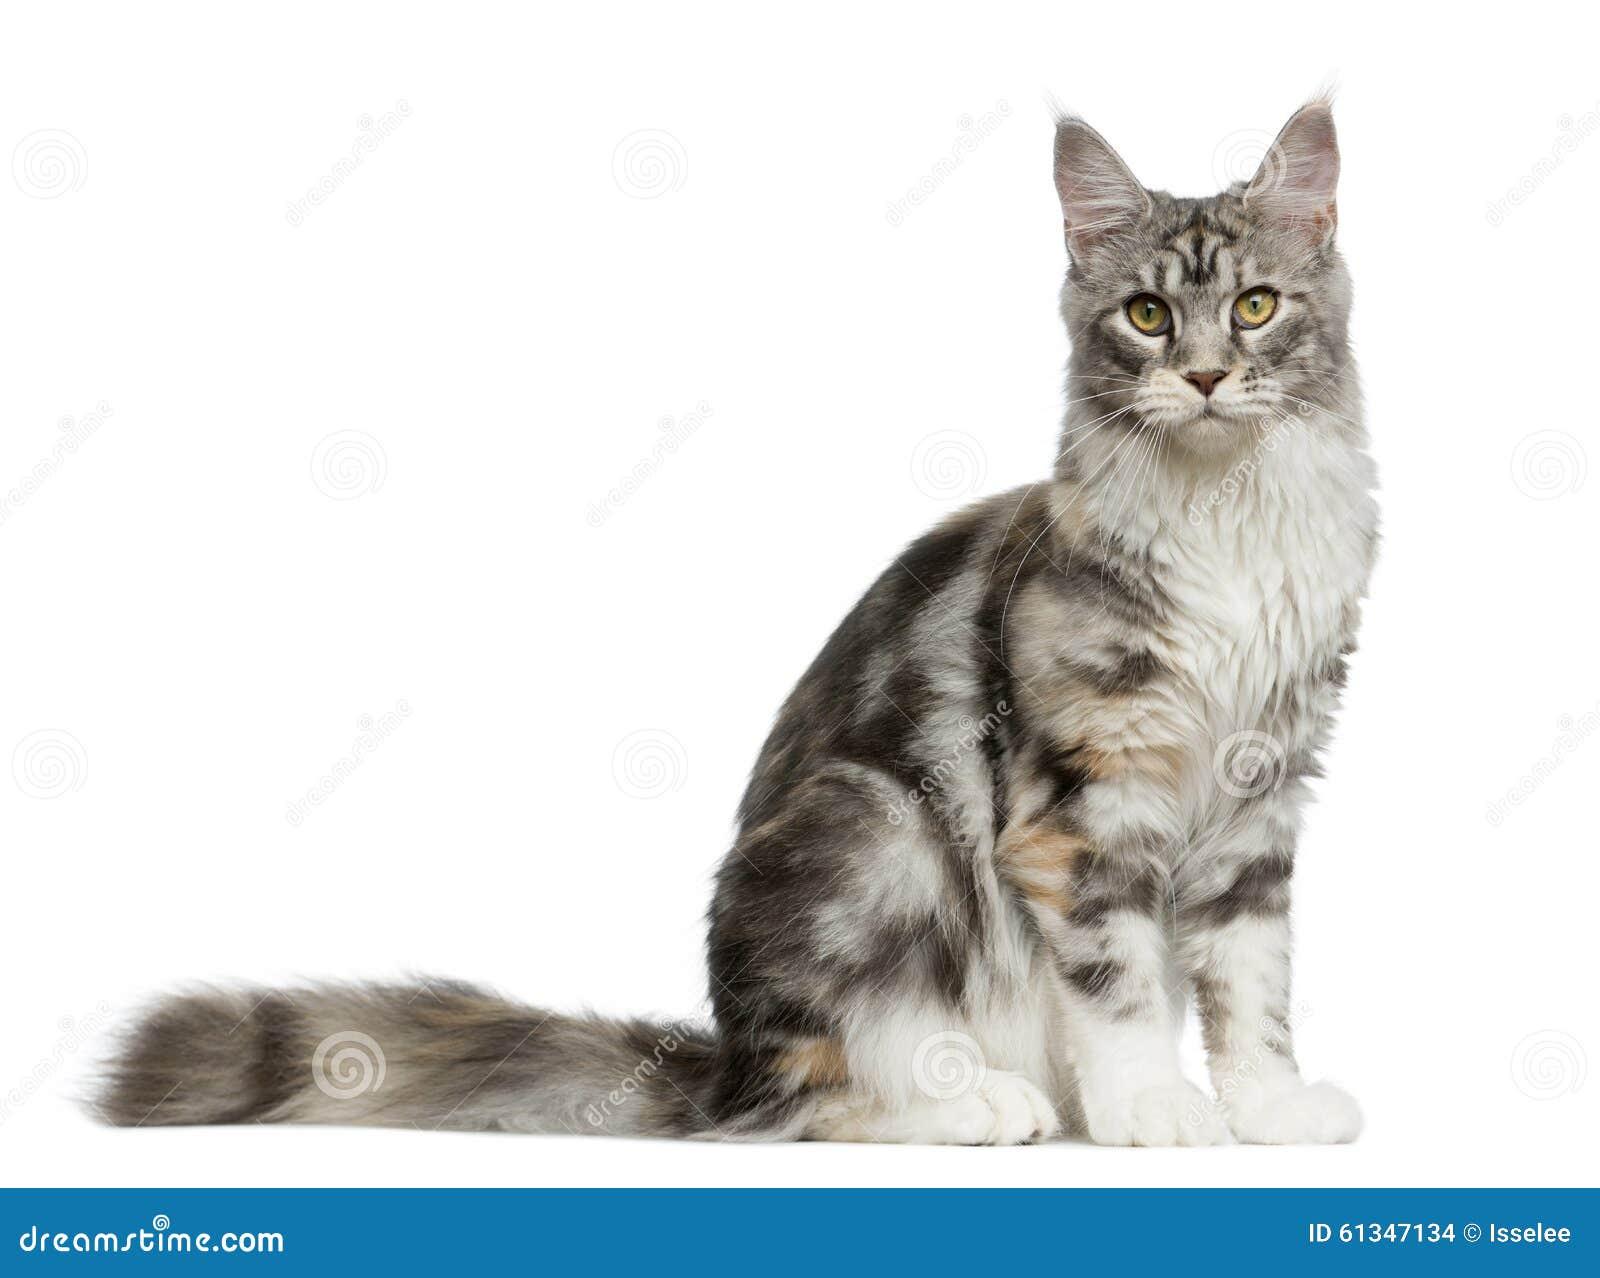 Alaskan Lynx Cat Breed